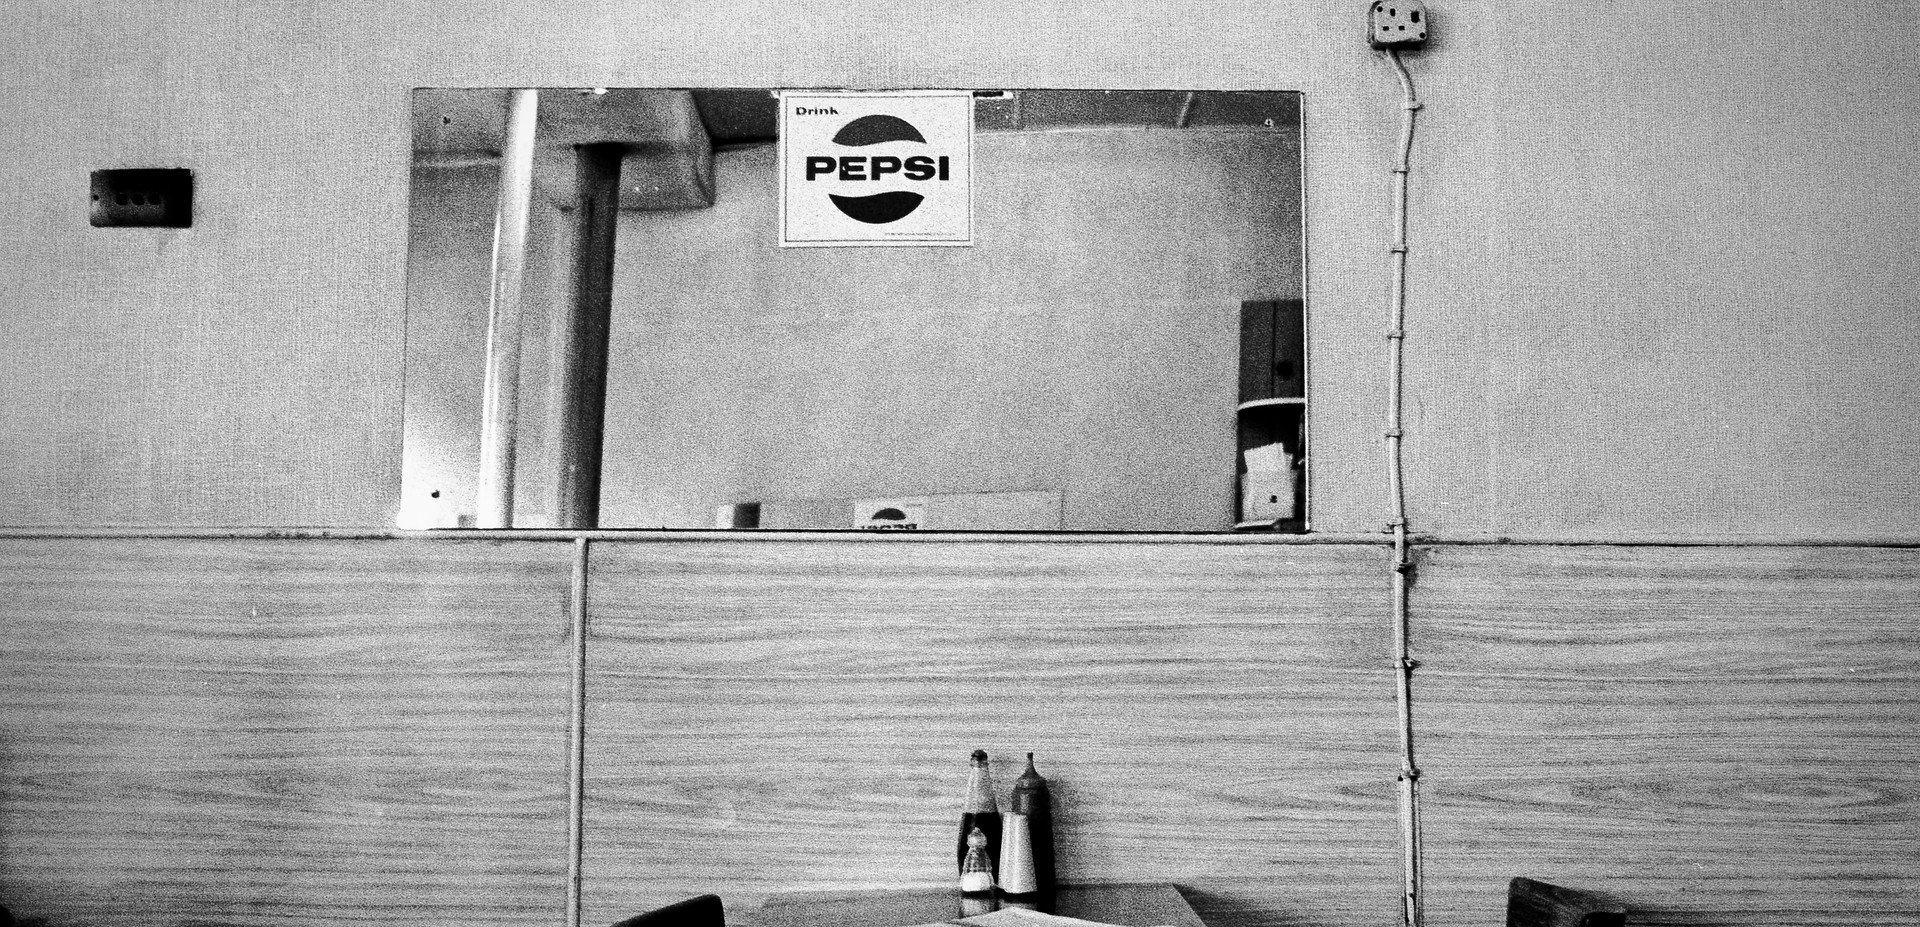 Pepsi_London, England 1991